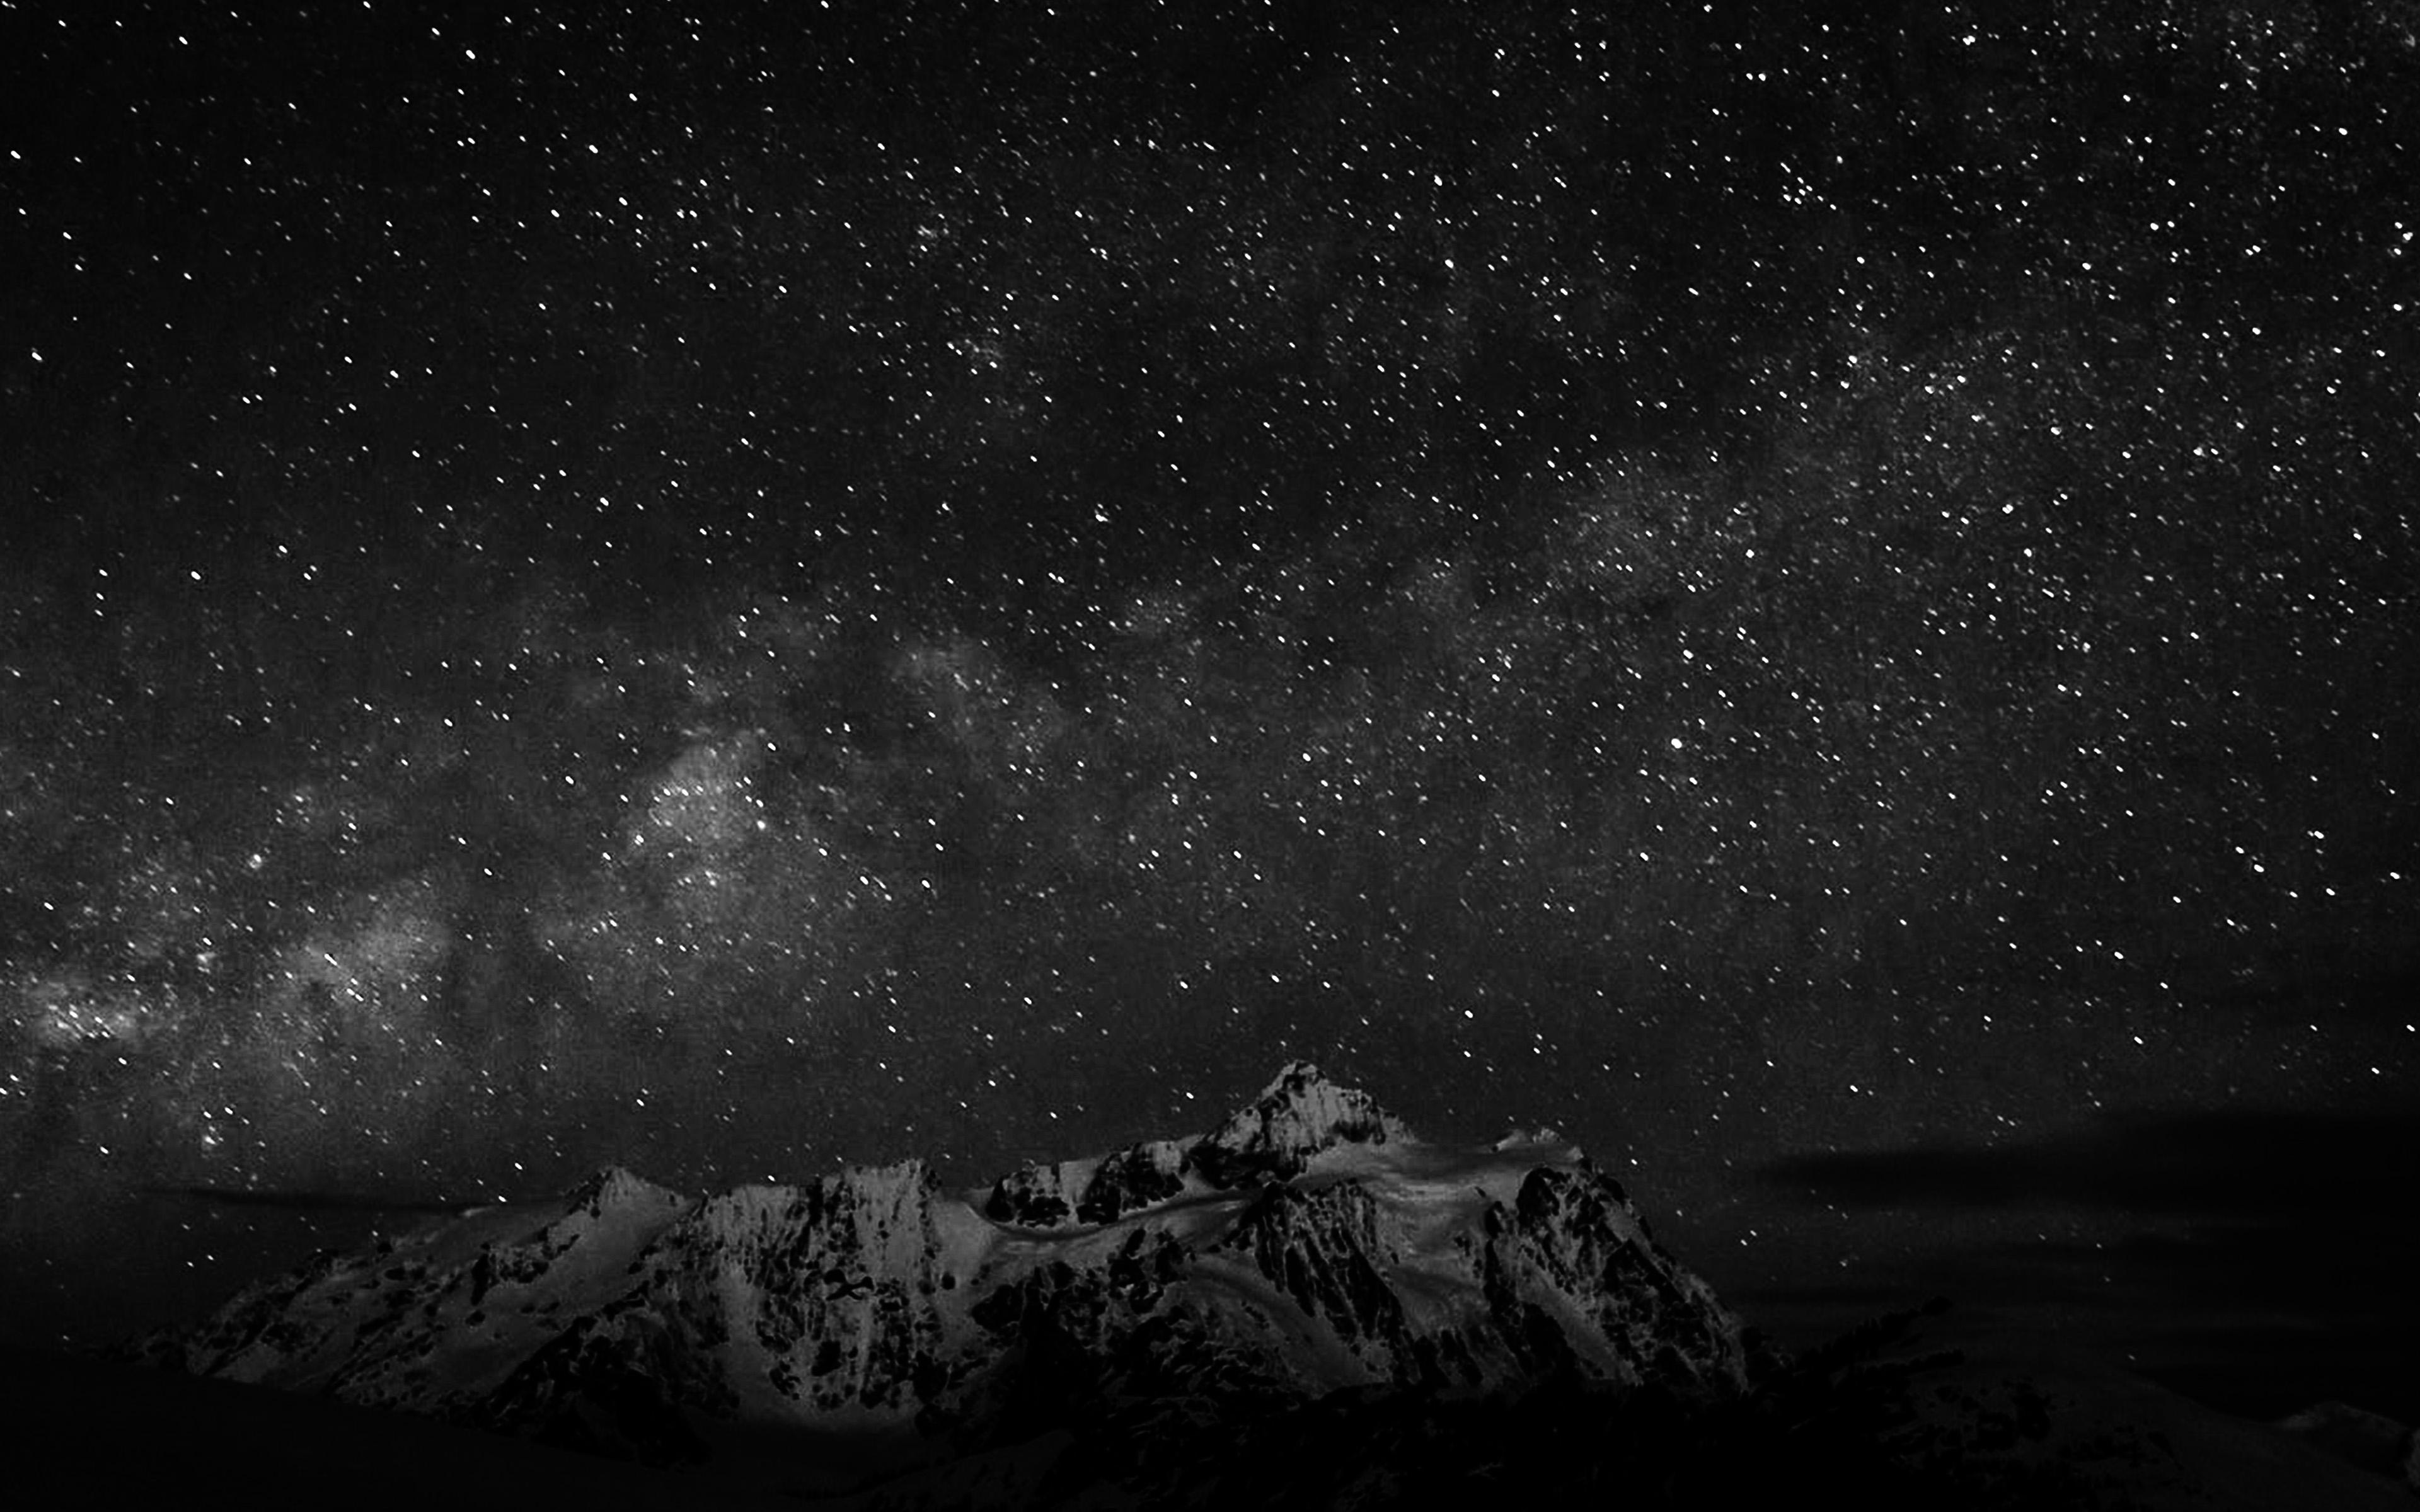 4k wallpaper of night sky for Night sky wallpaper 4k